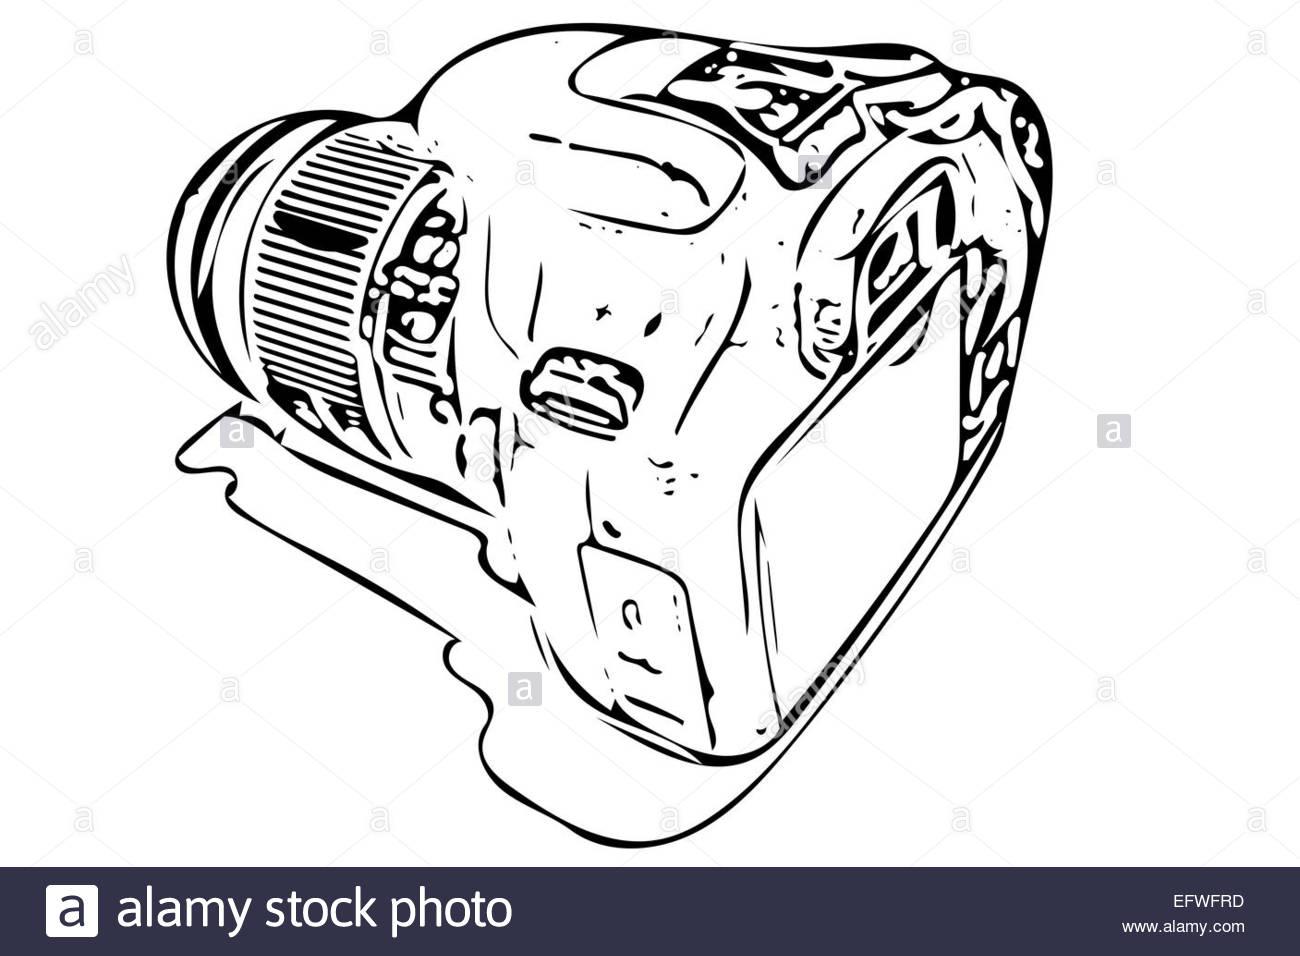 1300x956 Dslr Camera Illustration Stock Photo, Royalty Free Image 78622529